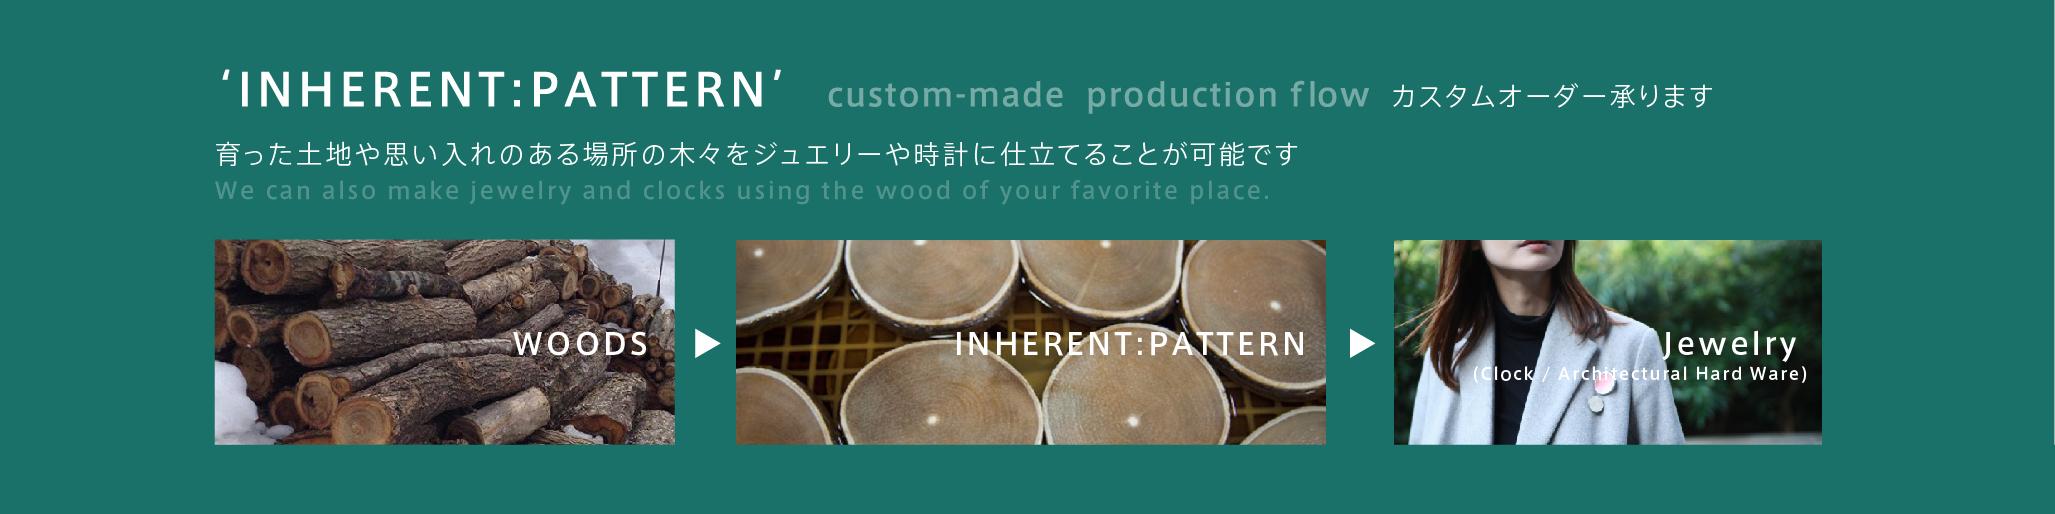 Custom made inherentpattern